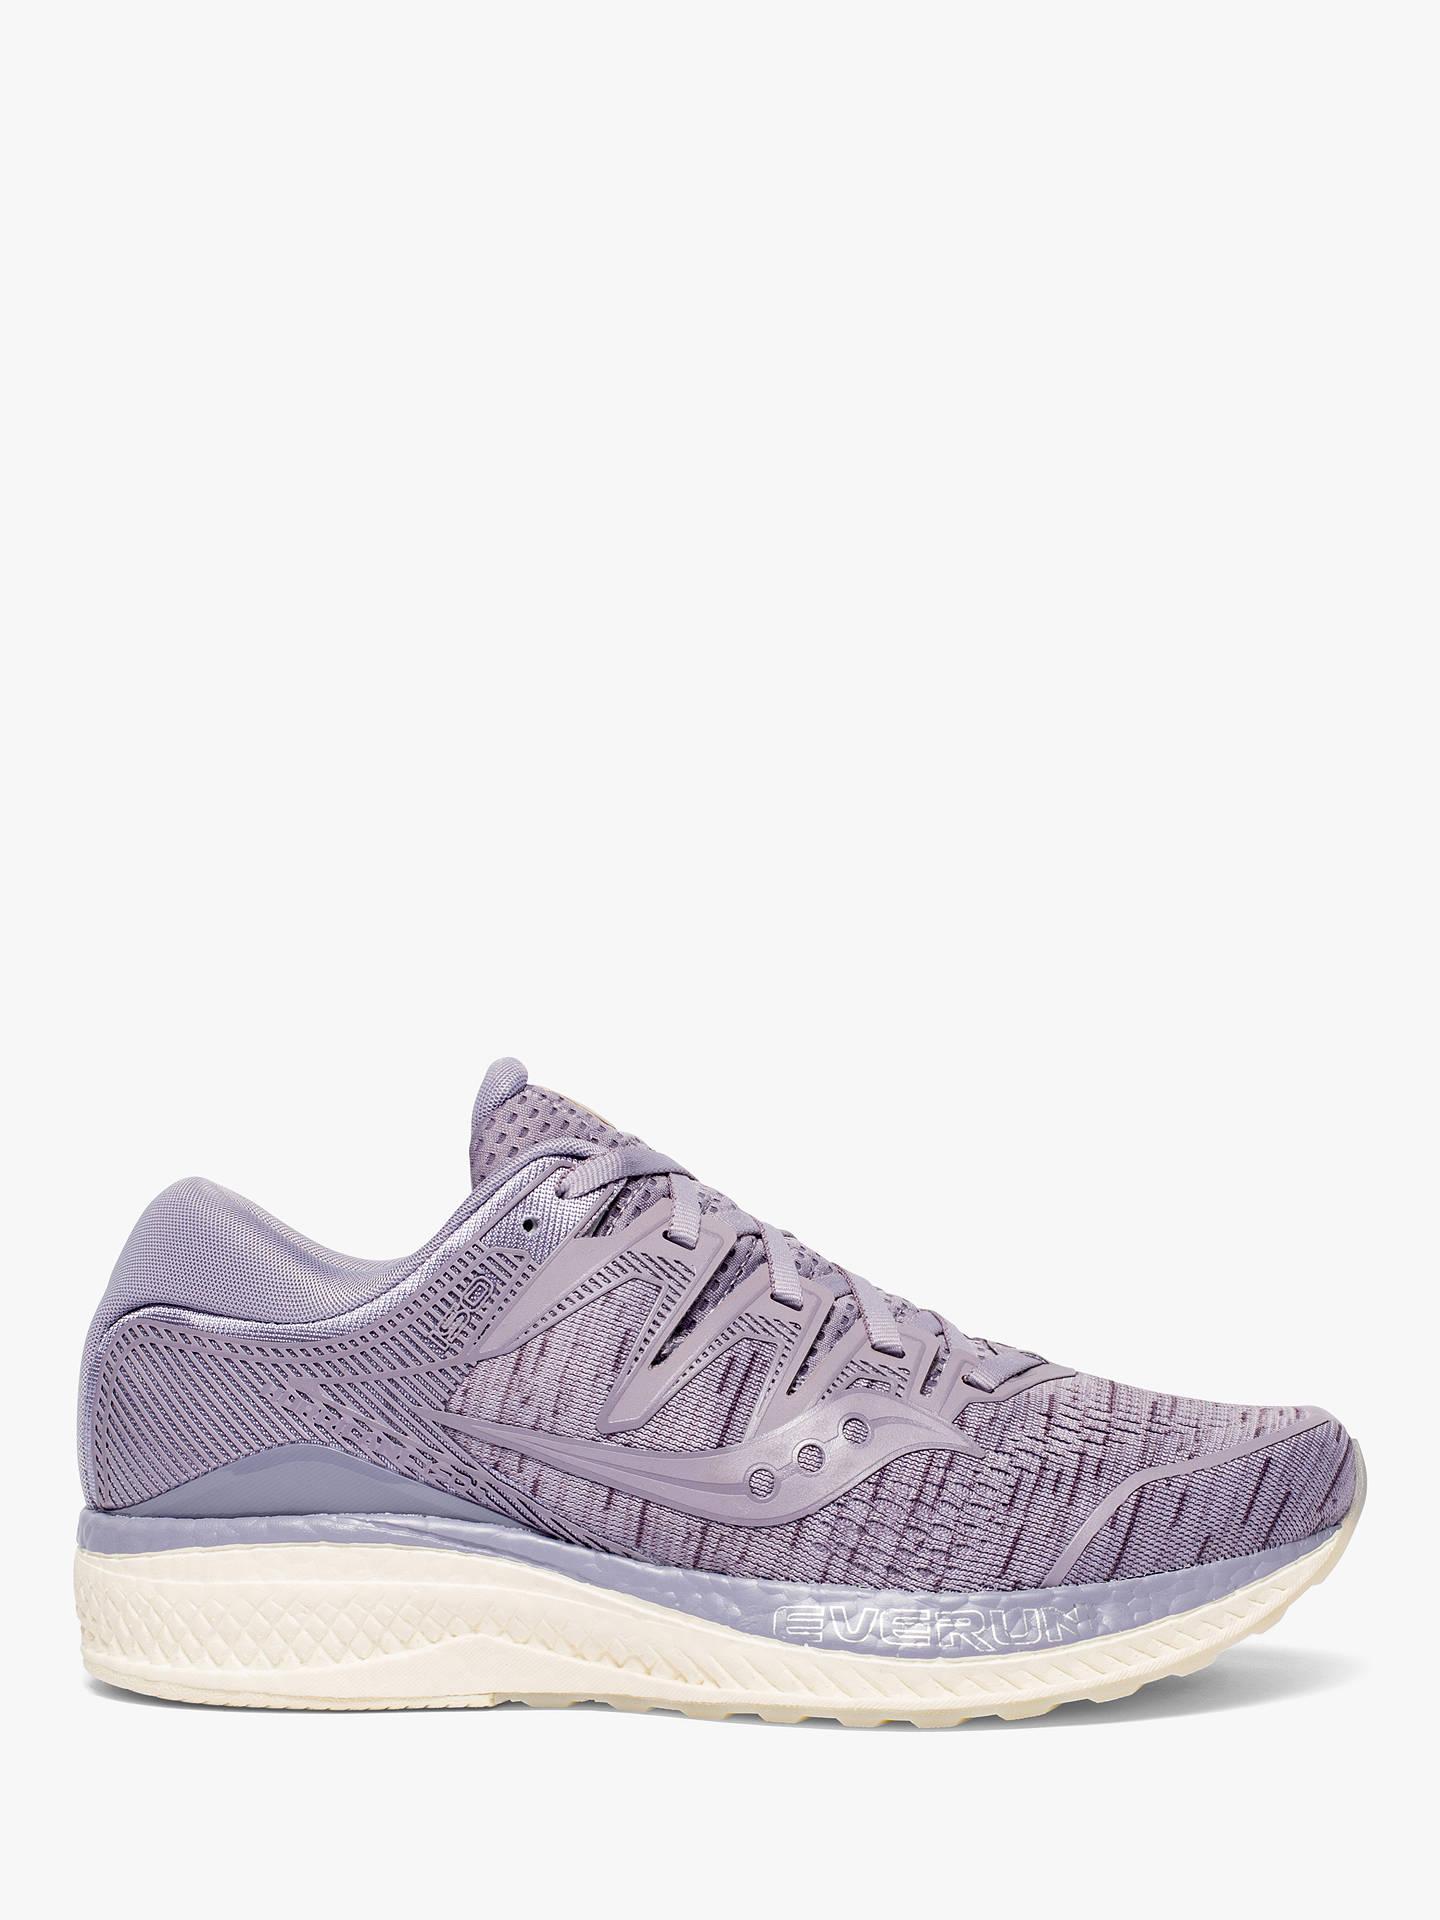 2fa1024ddf Saucony Hurricane ISO 5 Women's Running Shoes, Purple at John Lewis ...